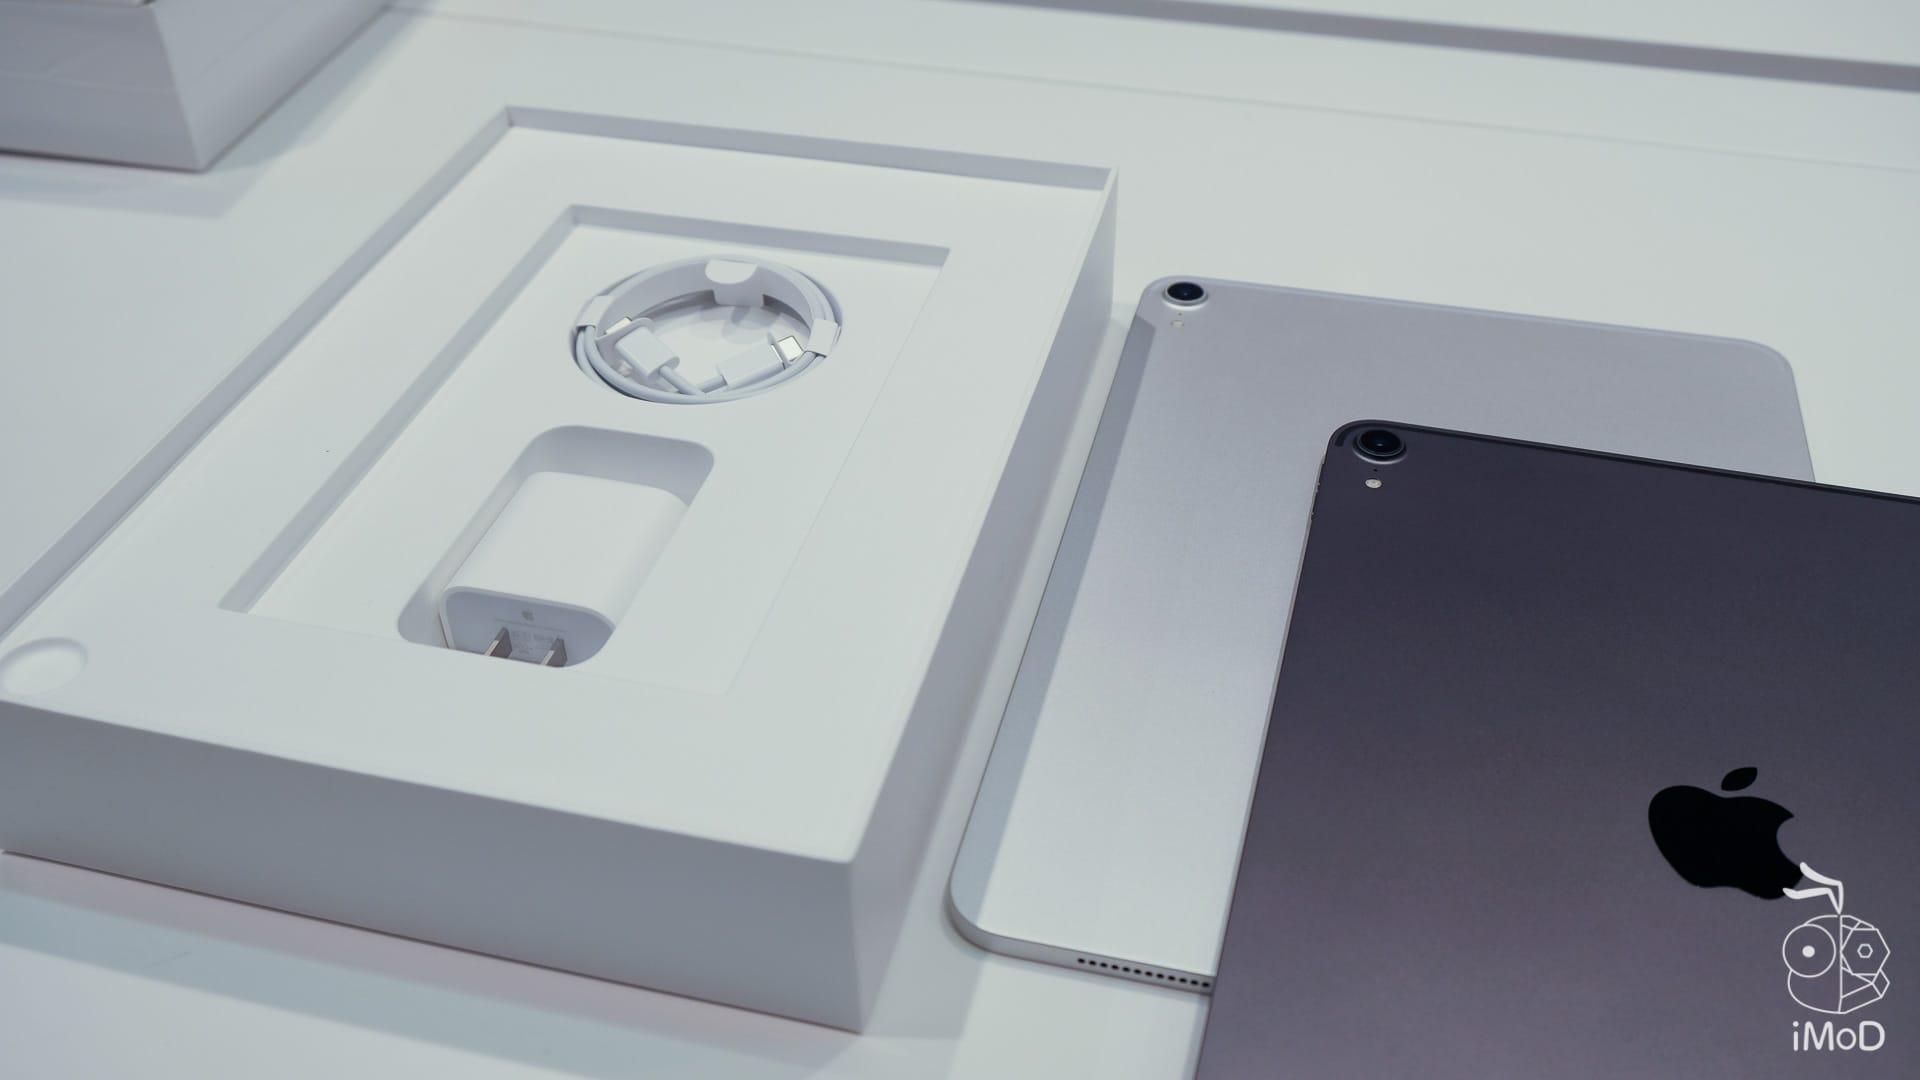 Ipad Pro Macbook Air 2018 Studio7 2438